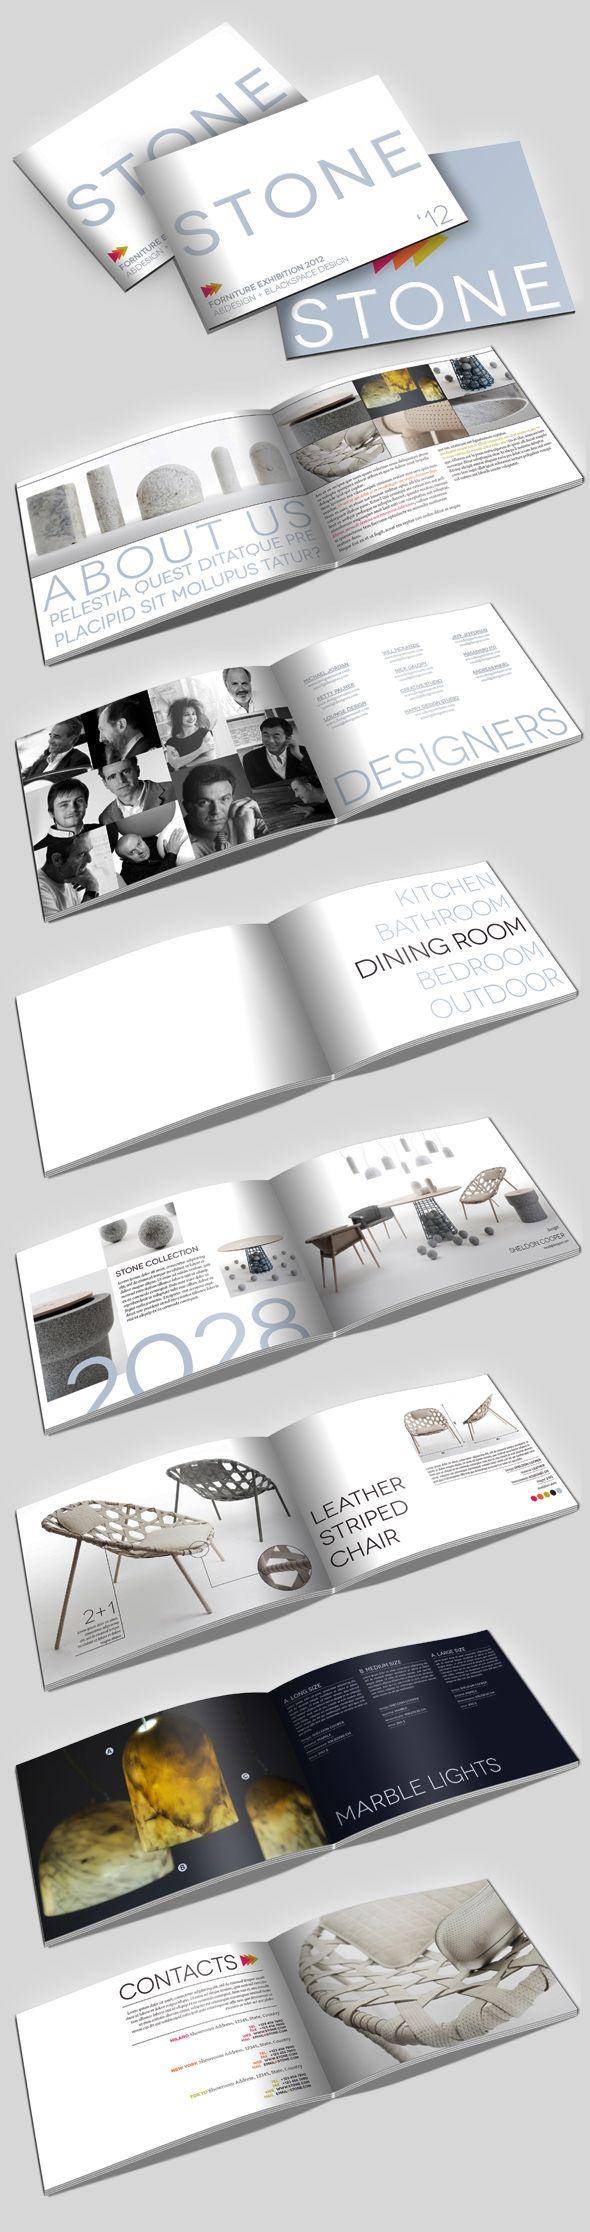 Layout & Design ideas